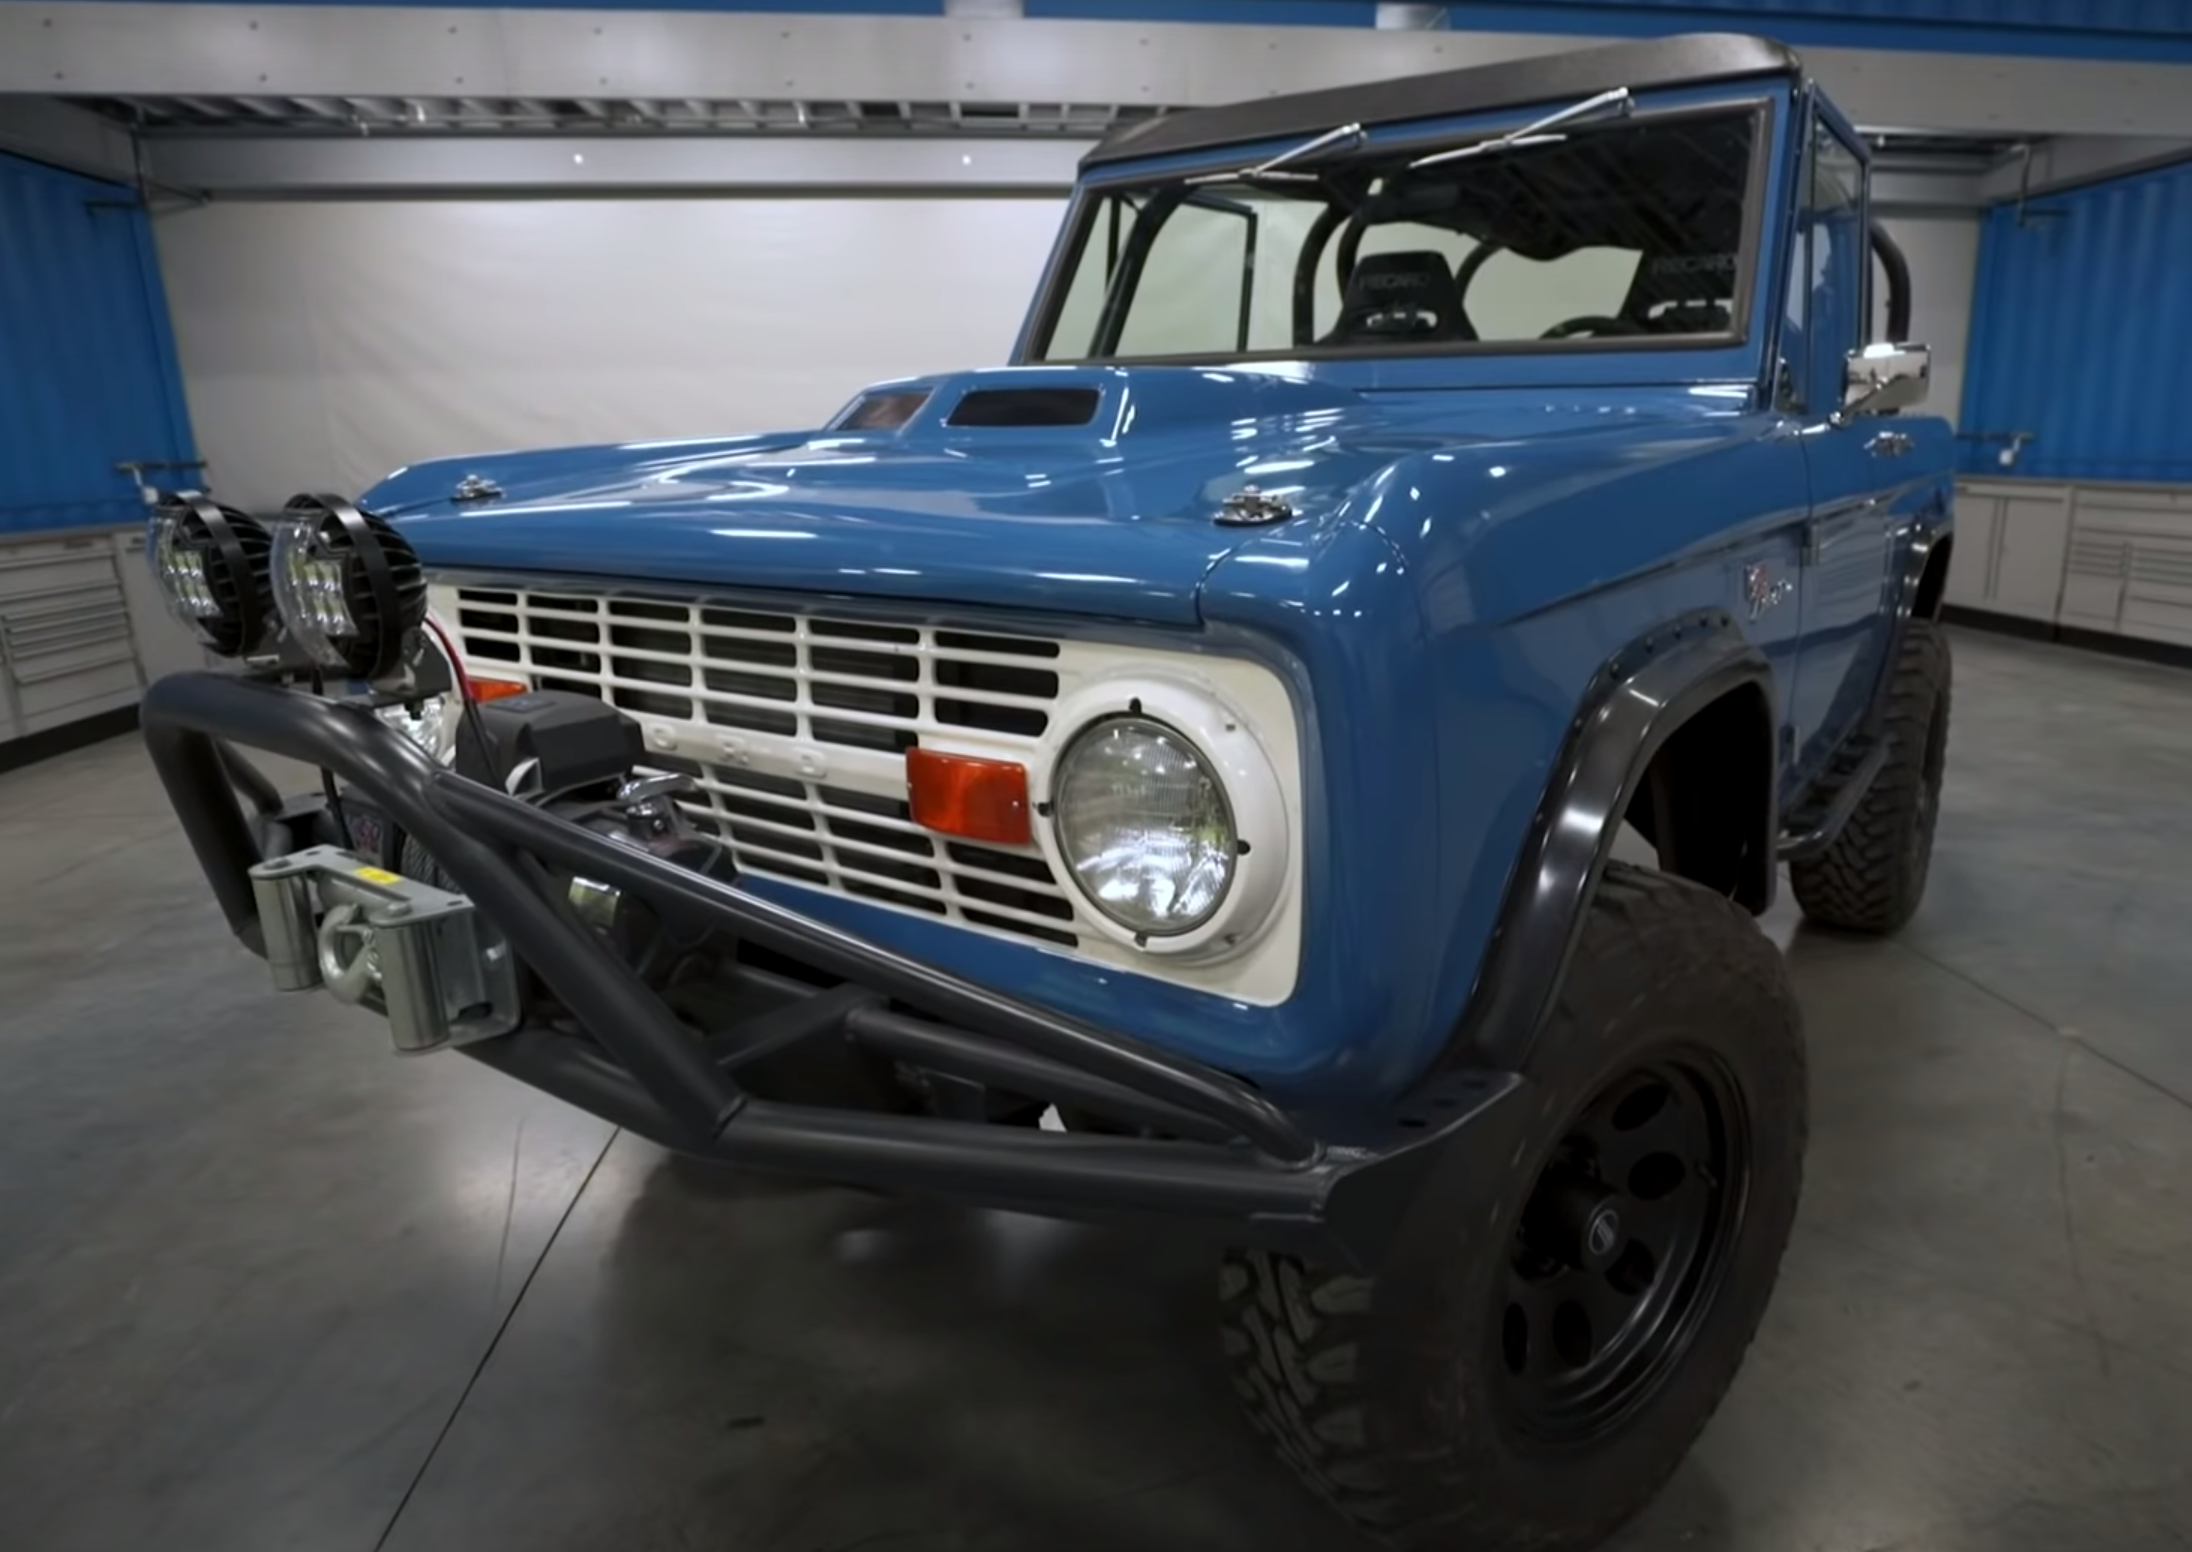 "<img src=""1974-bronco.png"" alt=""1974 Ford Bronco"">"